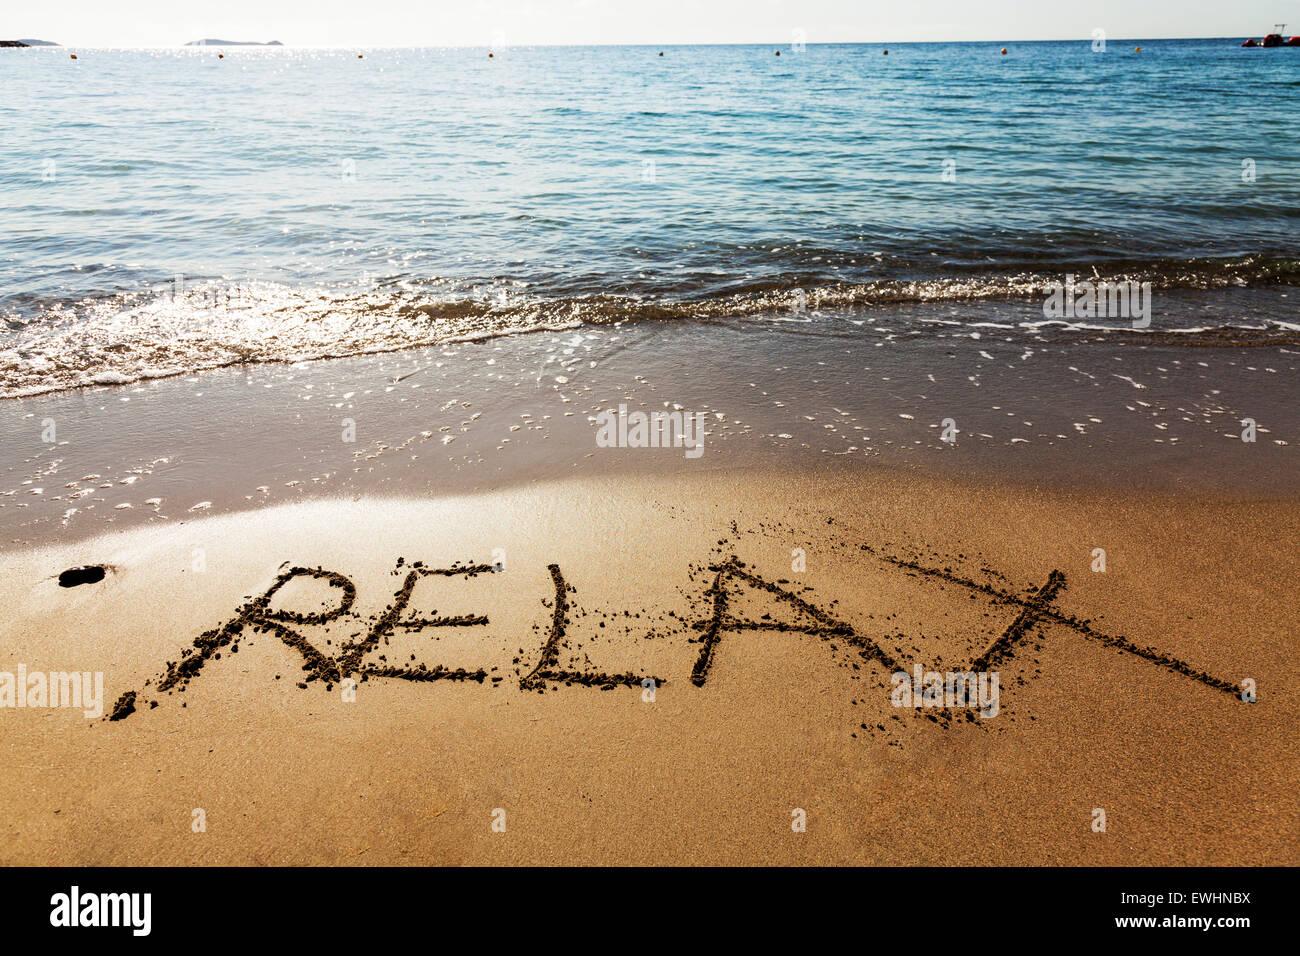 Relax in sand word written on beach coast chill holiday getaway sea coastline Ibiza Spain Spanish Santa Eulalia Stock Photo